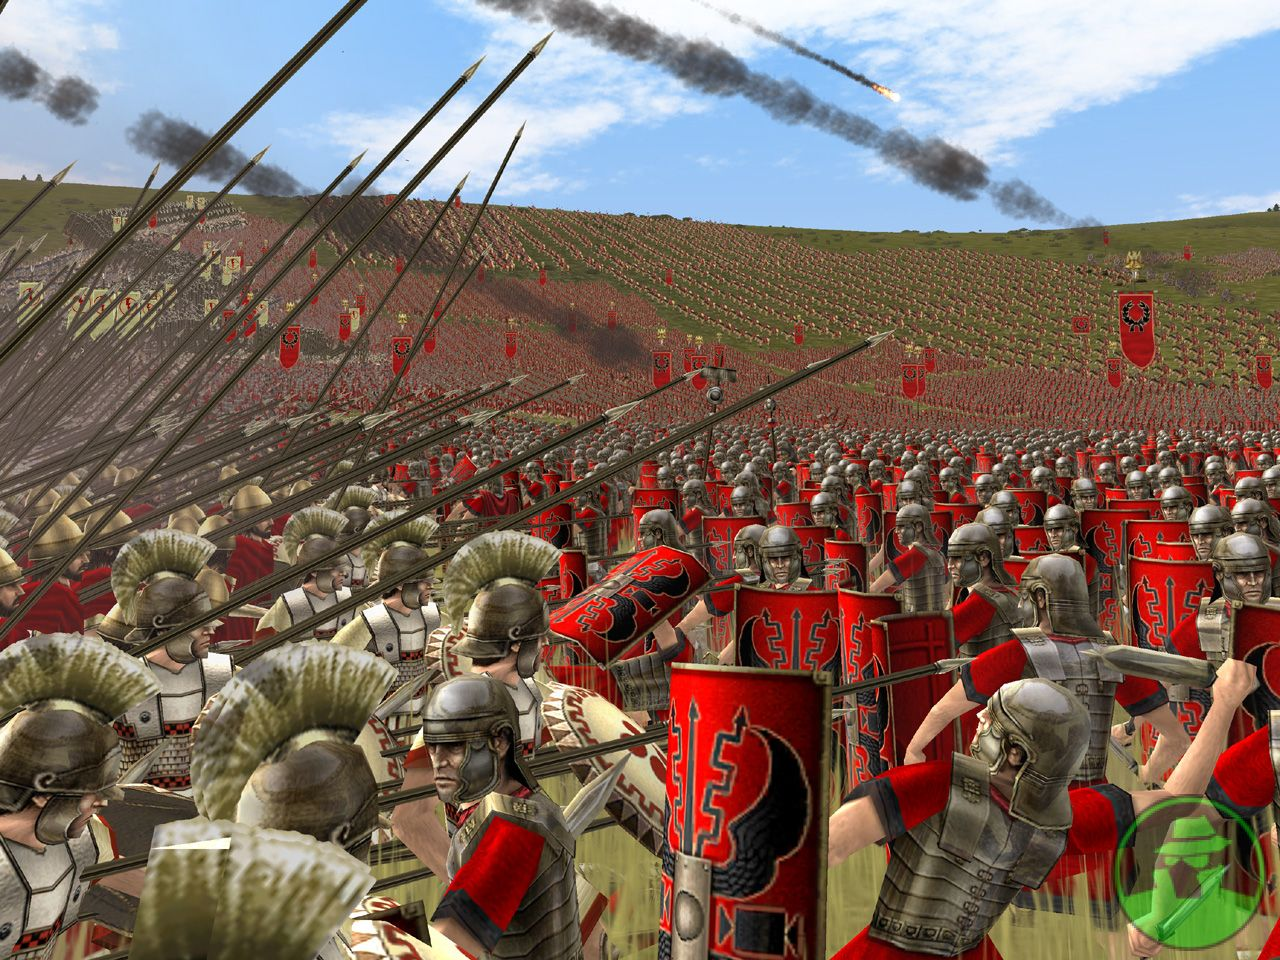 Rome Total War Screen Shots, Wallpapers